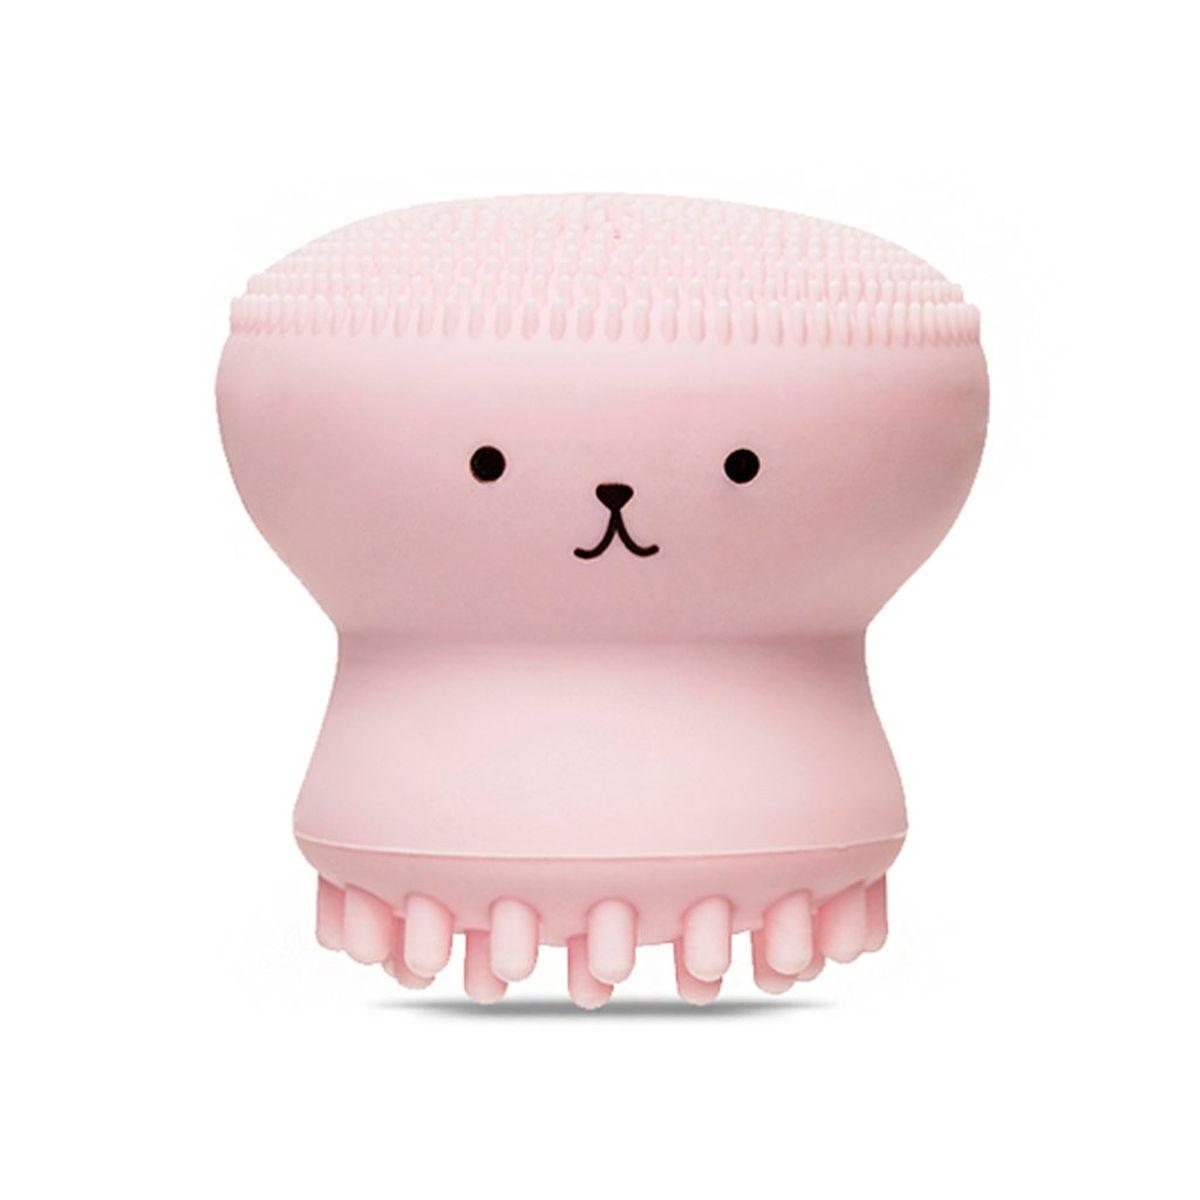 Щеточка для очистки пор Etude House My Beauty Tool Exfoliating Jellyfish Silicon Brush